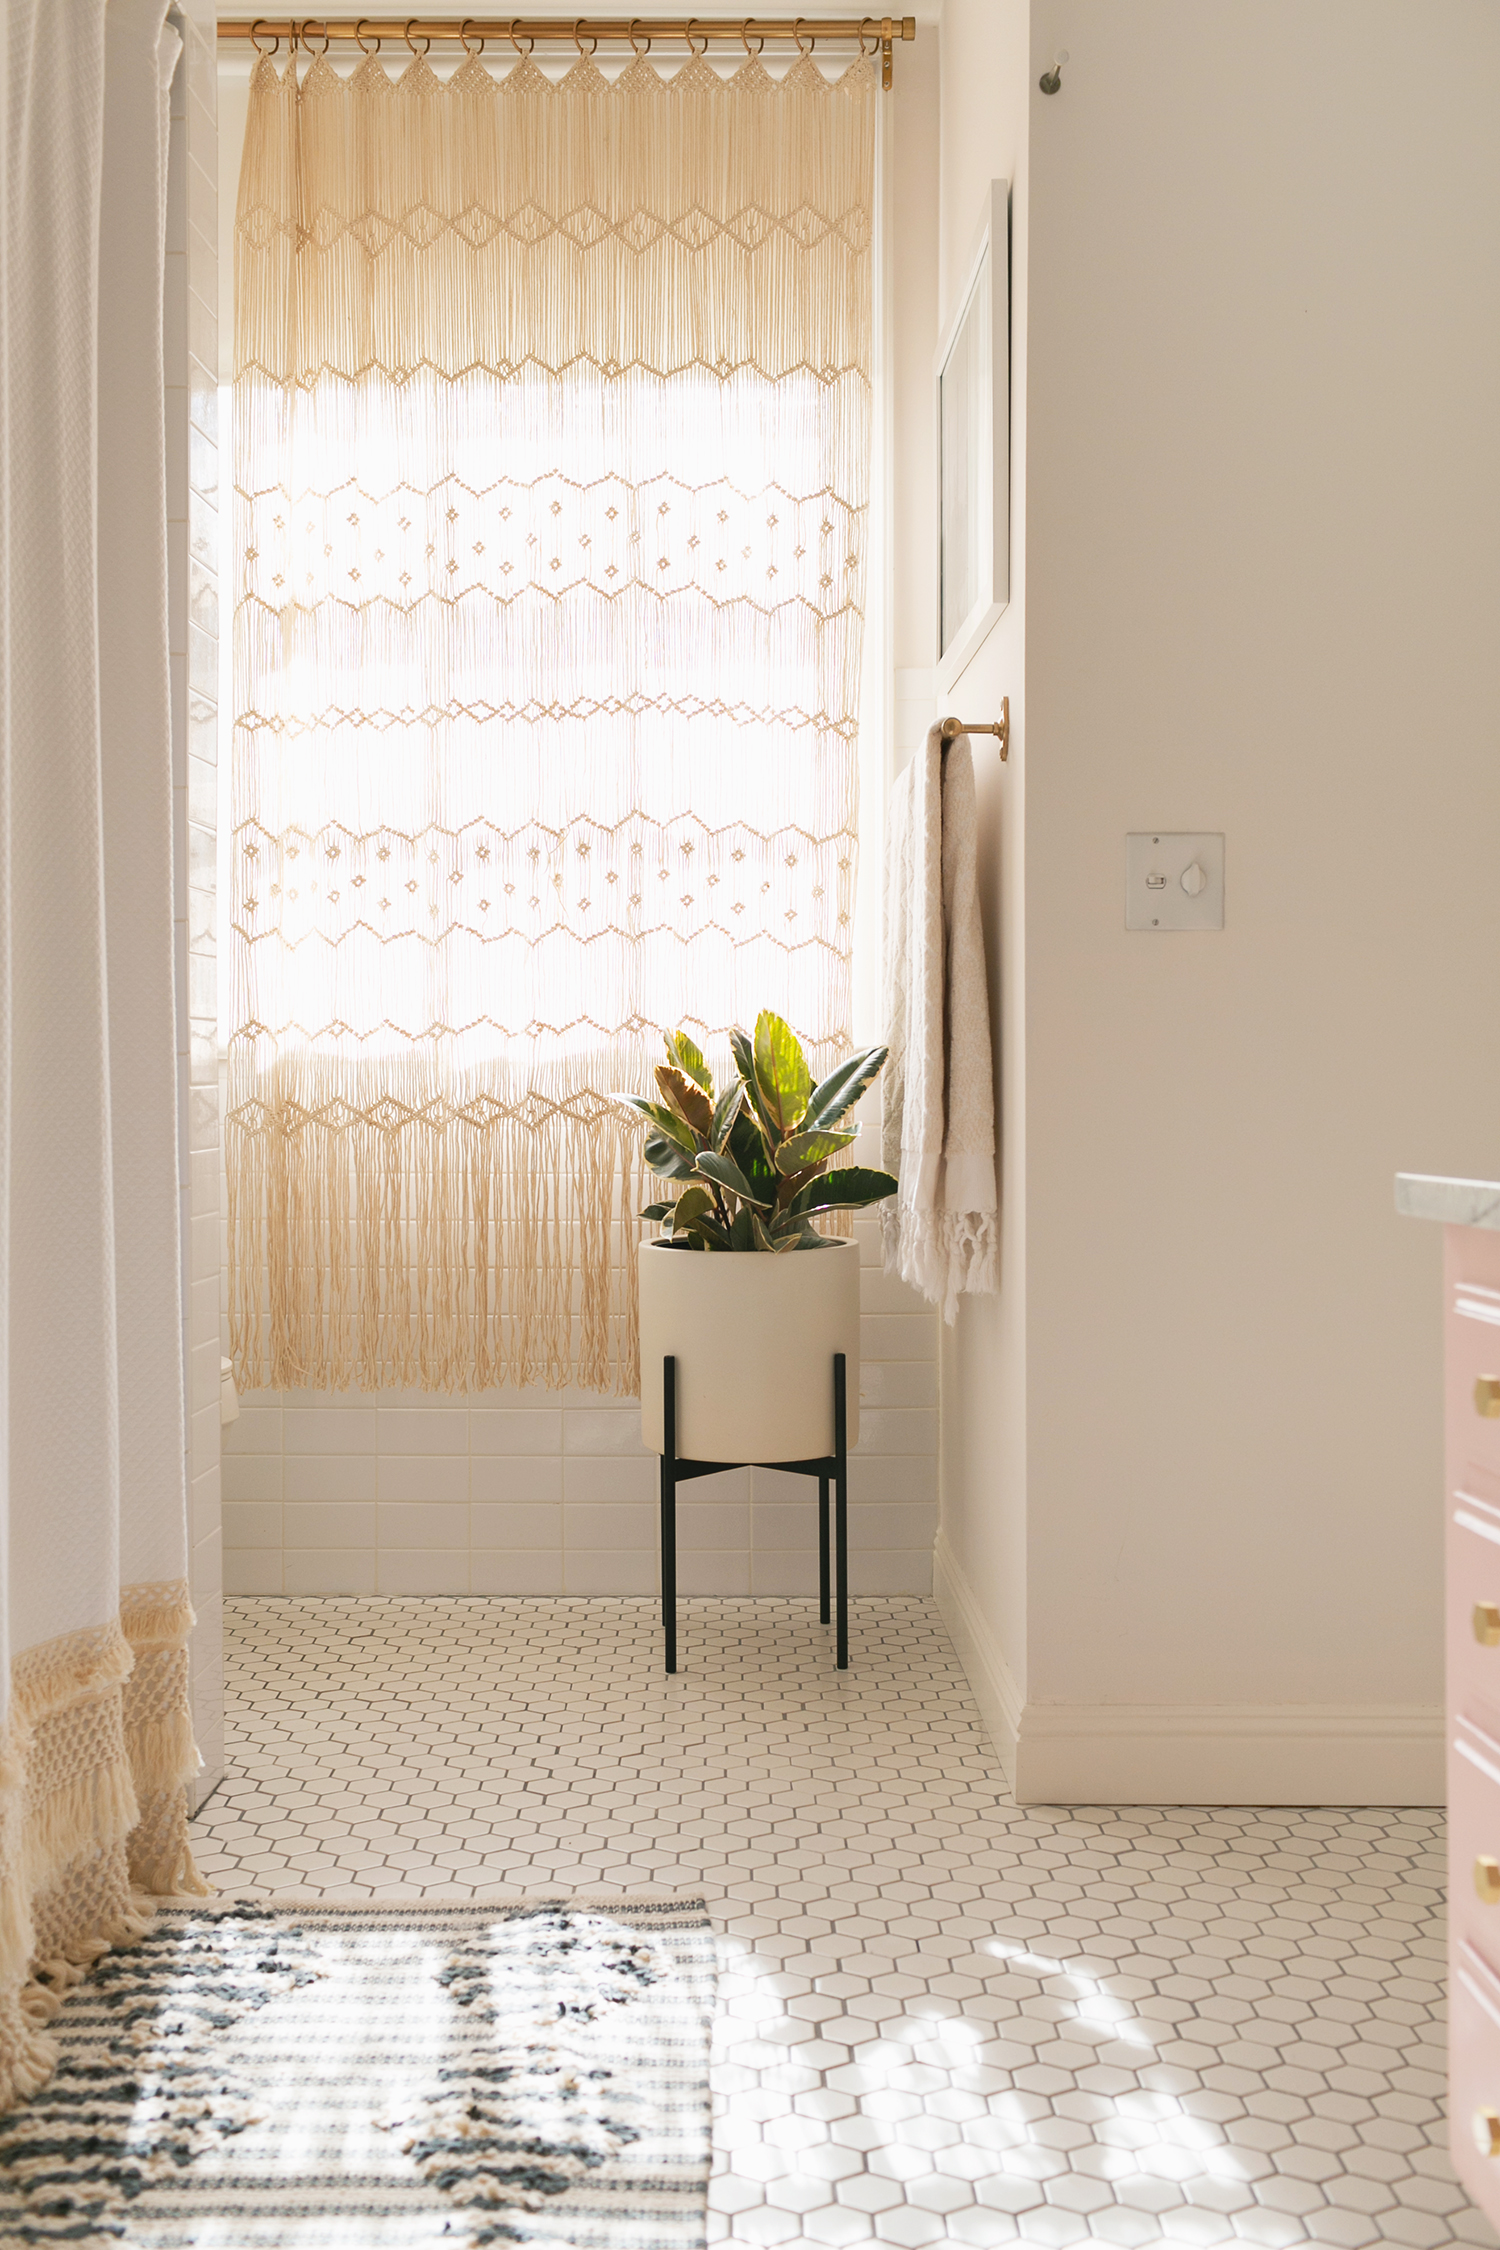 Neutral shower curtains